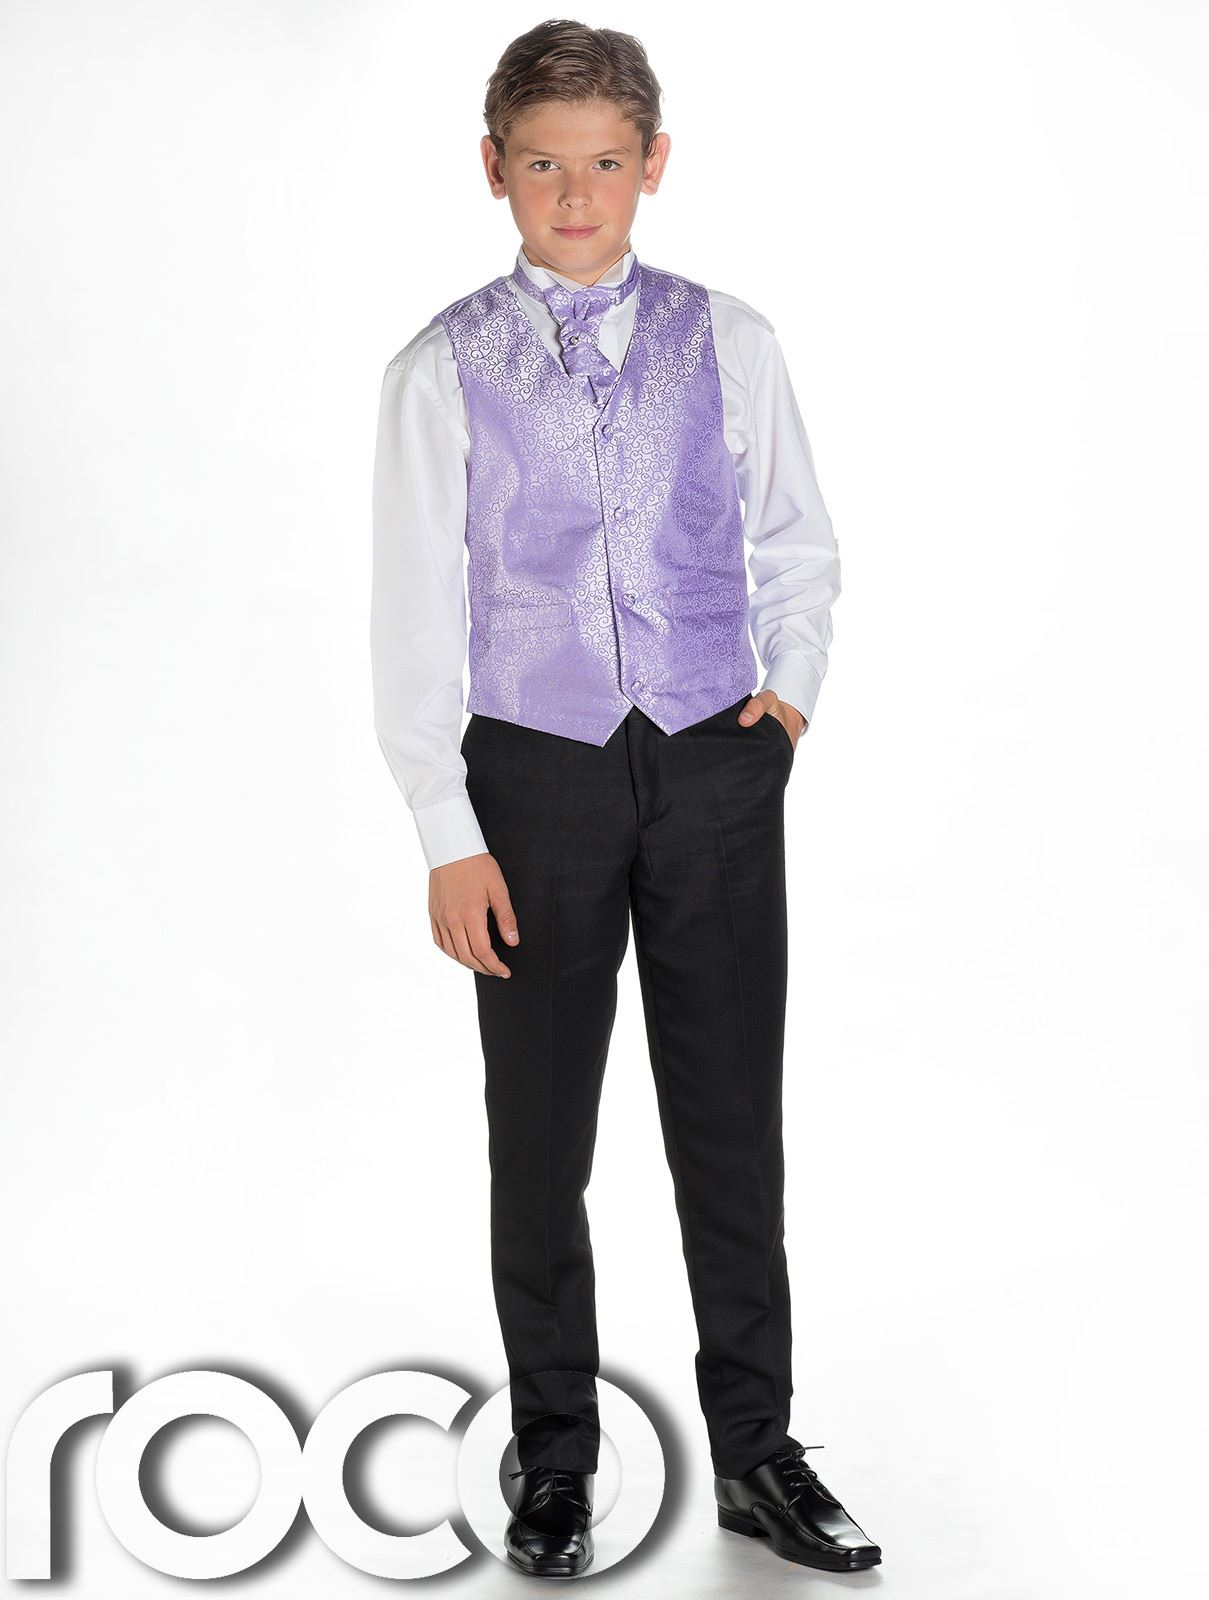 Page Boy Suits, Boys Wedding Suits, Boys Waistcoat Suit, Boys Formal ...